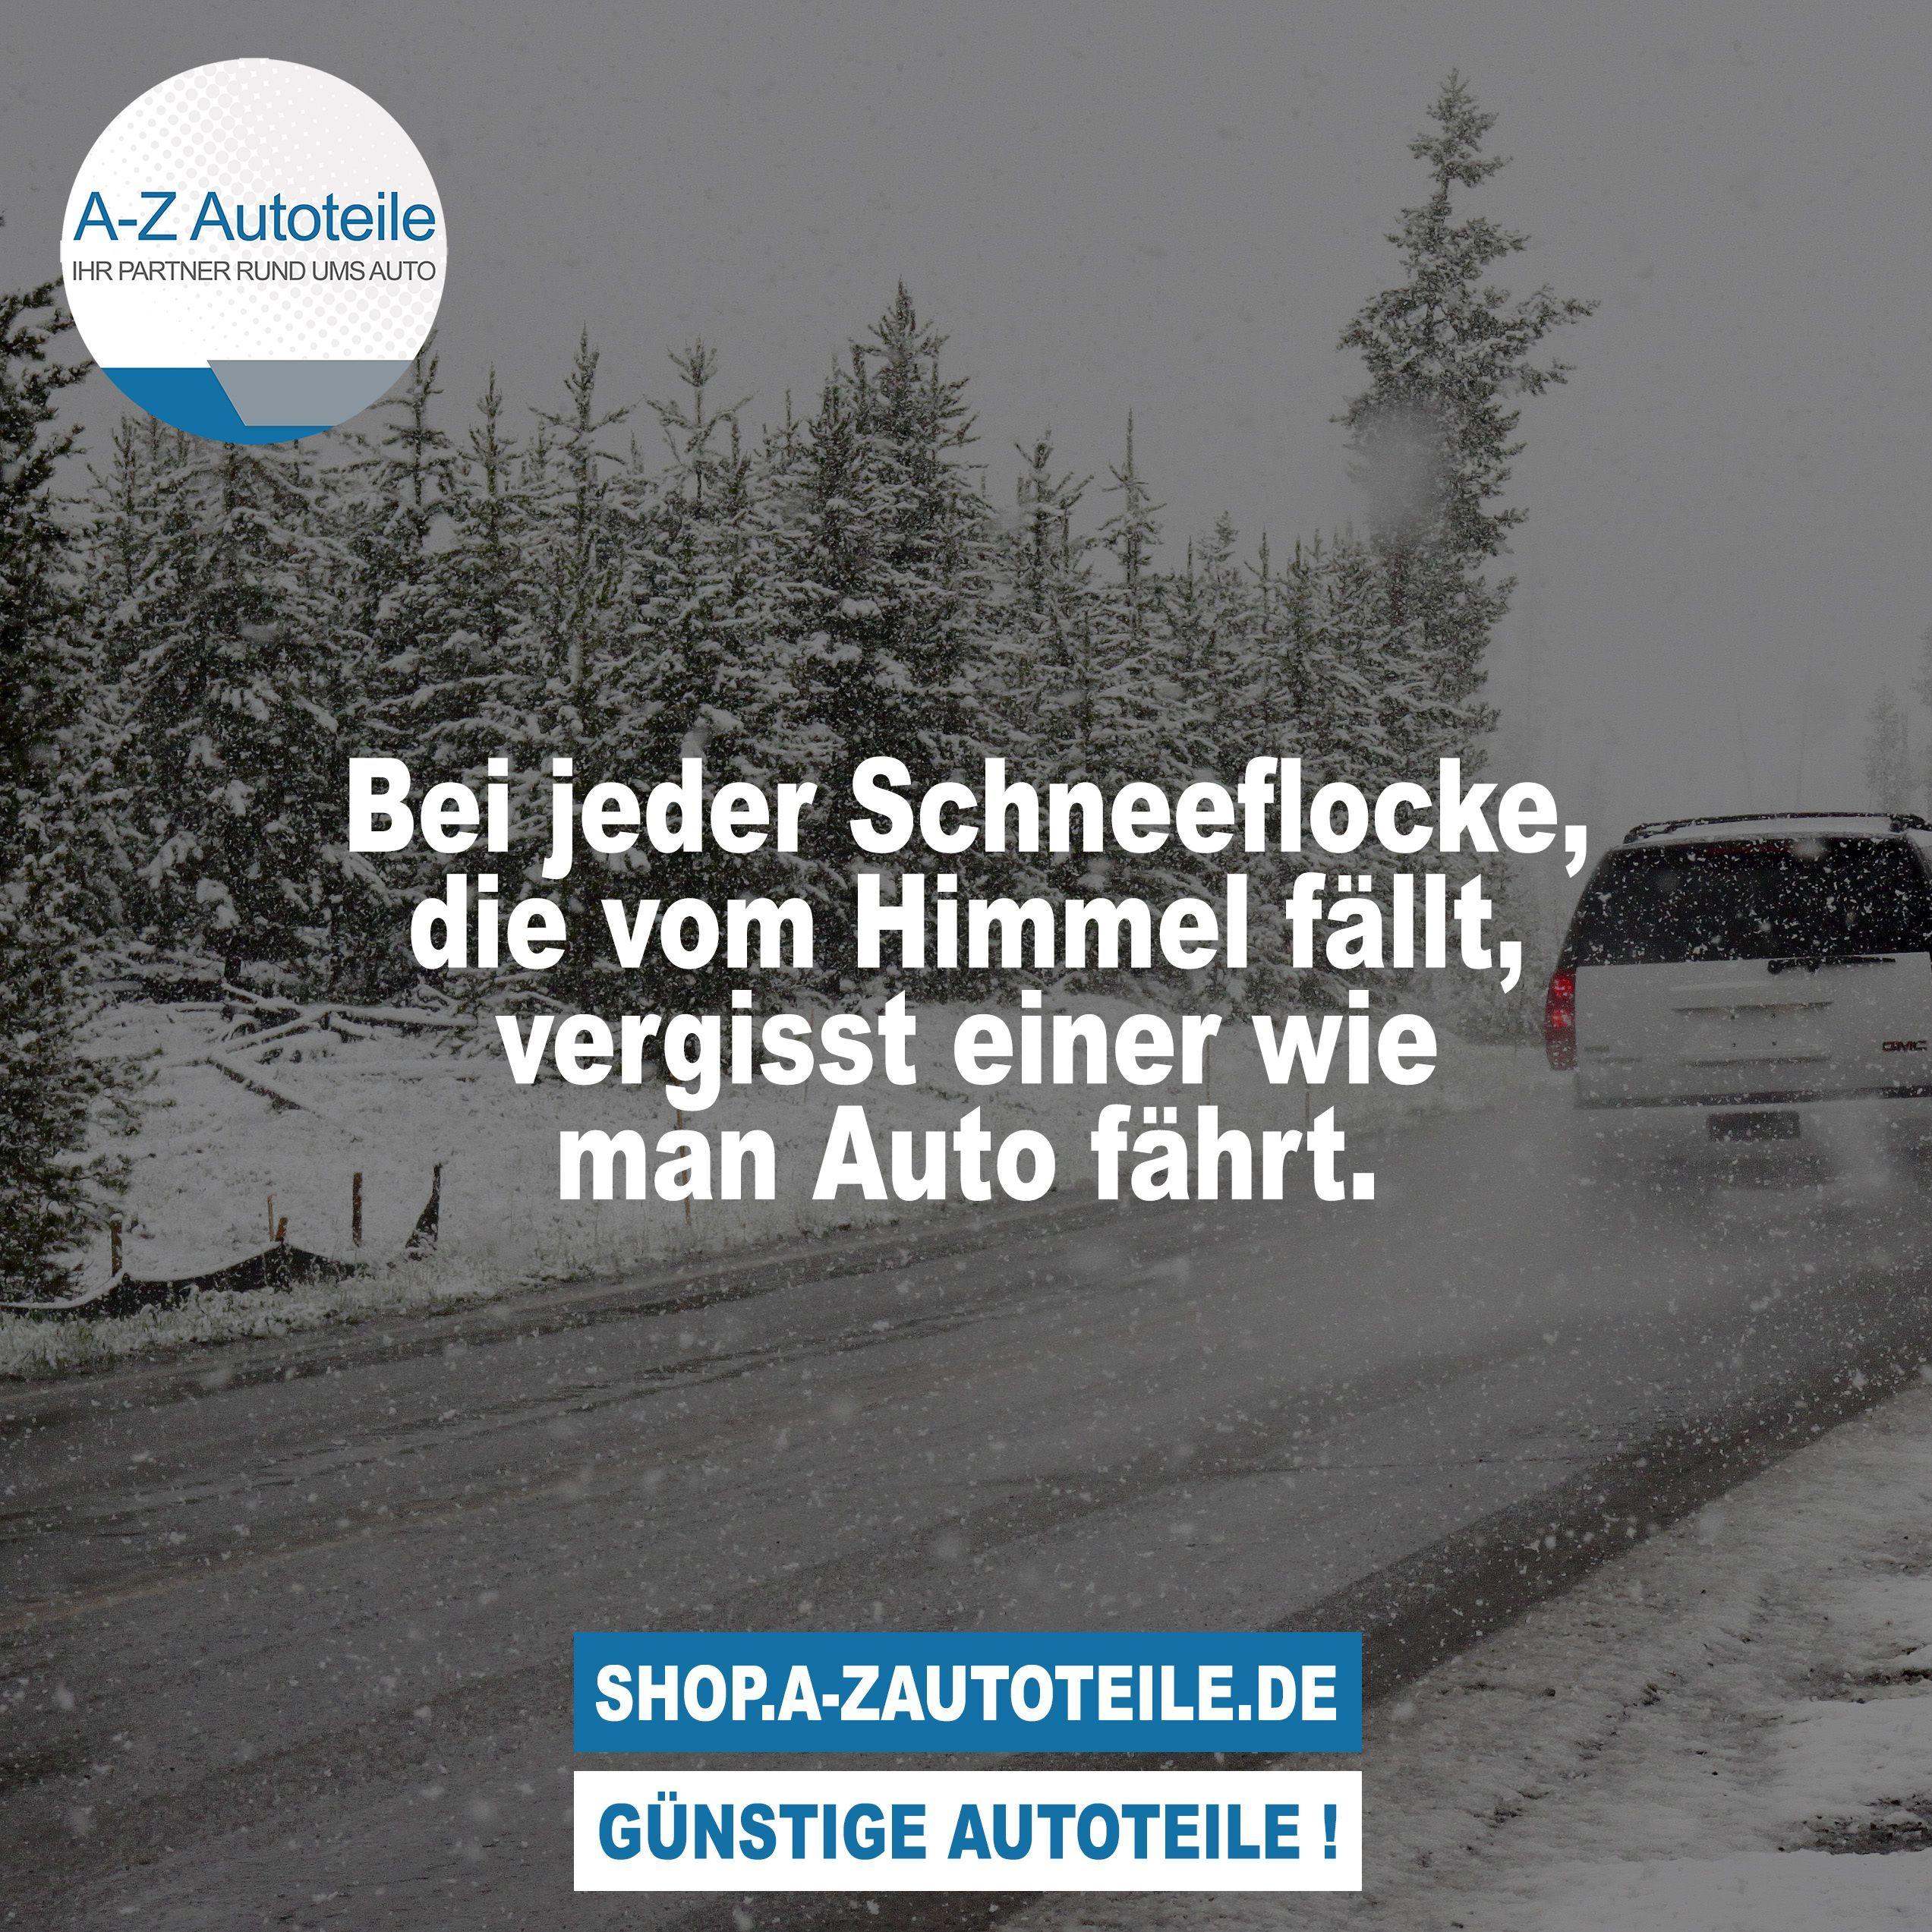 Schnee Winter Auto Autoteile Az Fakt Lustig Autohumor Auto Humor Autos Autoteile